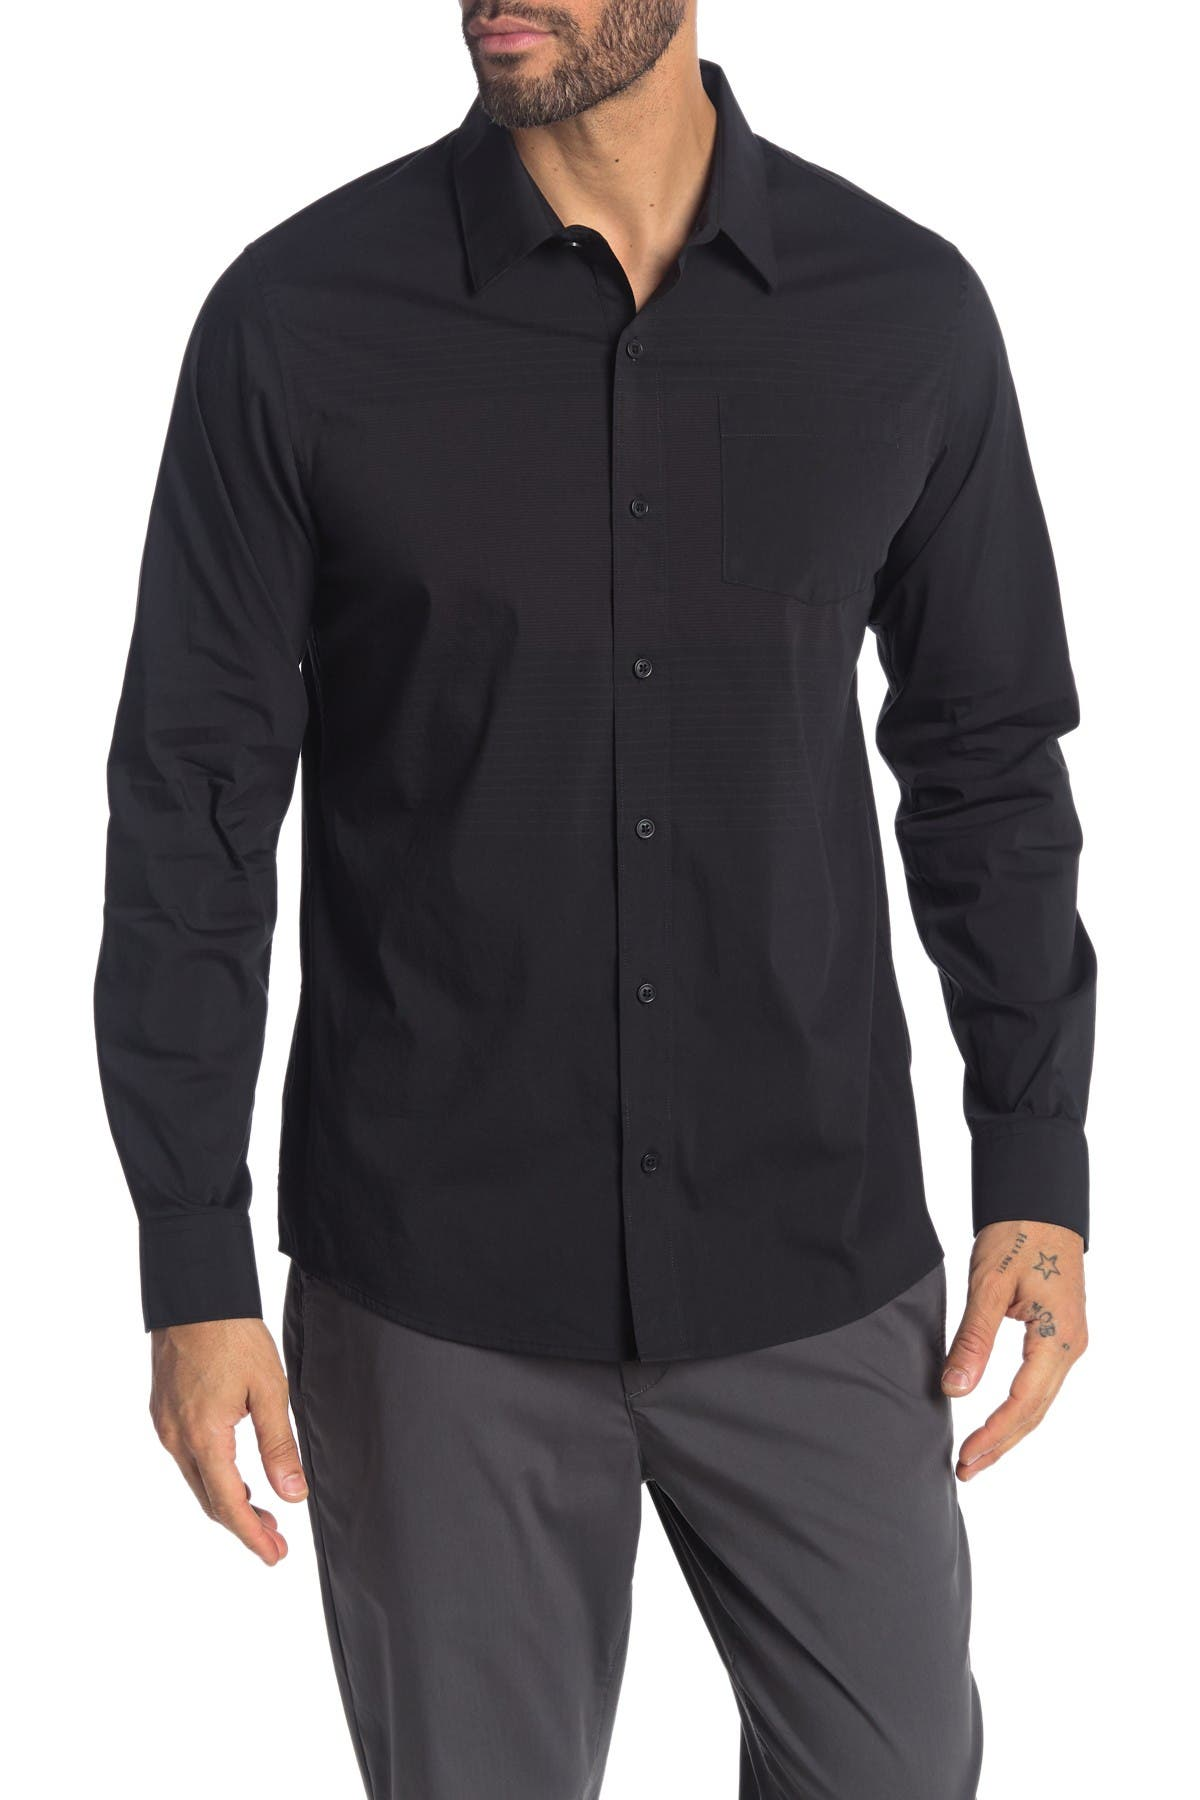 Image of TRAVIS MATHEW Rissey Long Sleeve Button Down Shirt